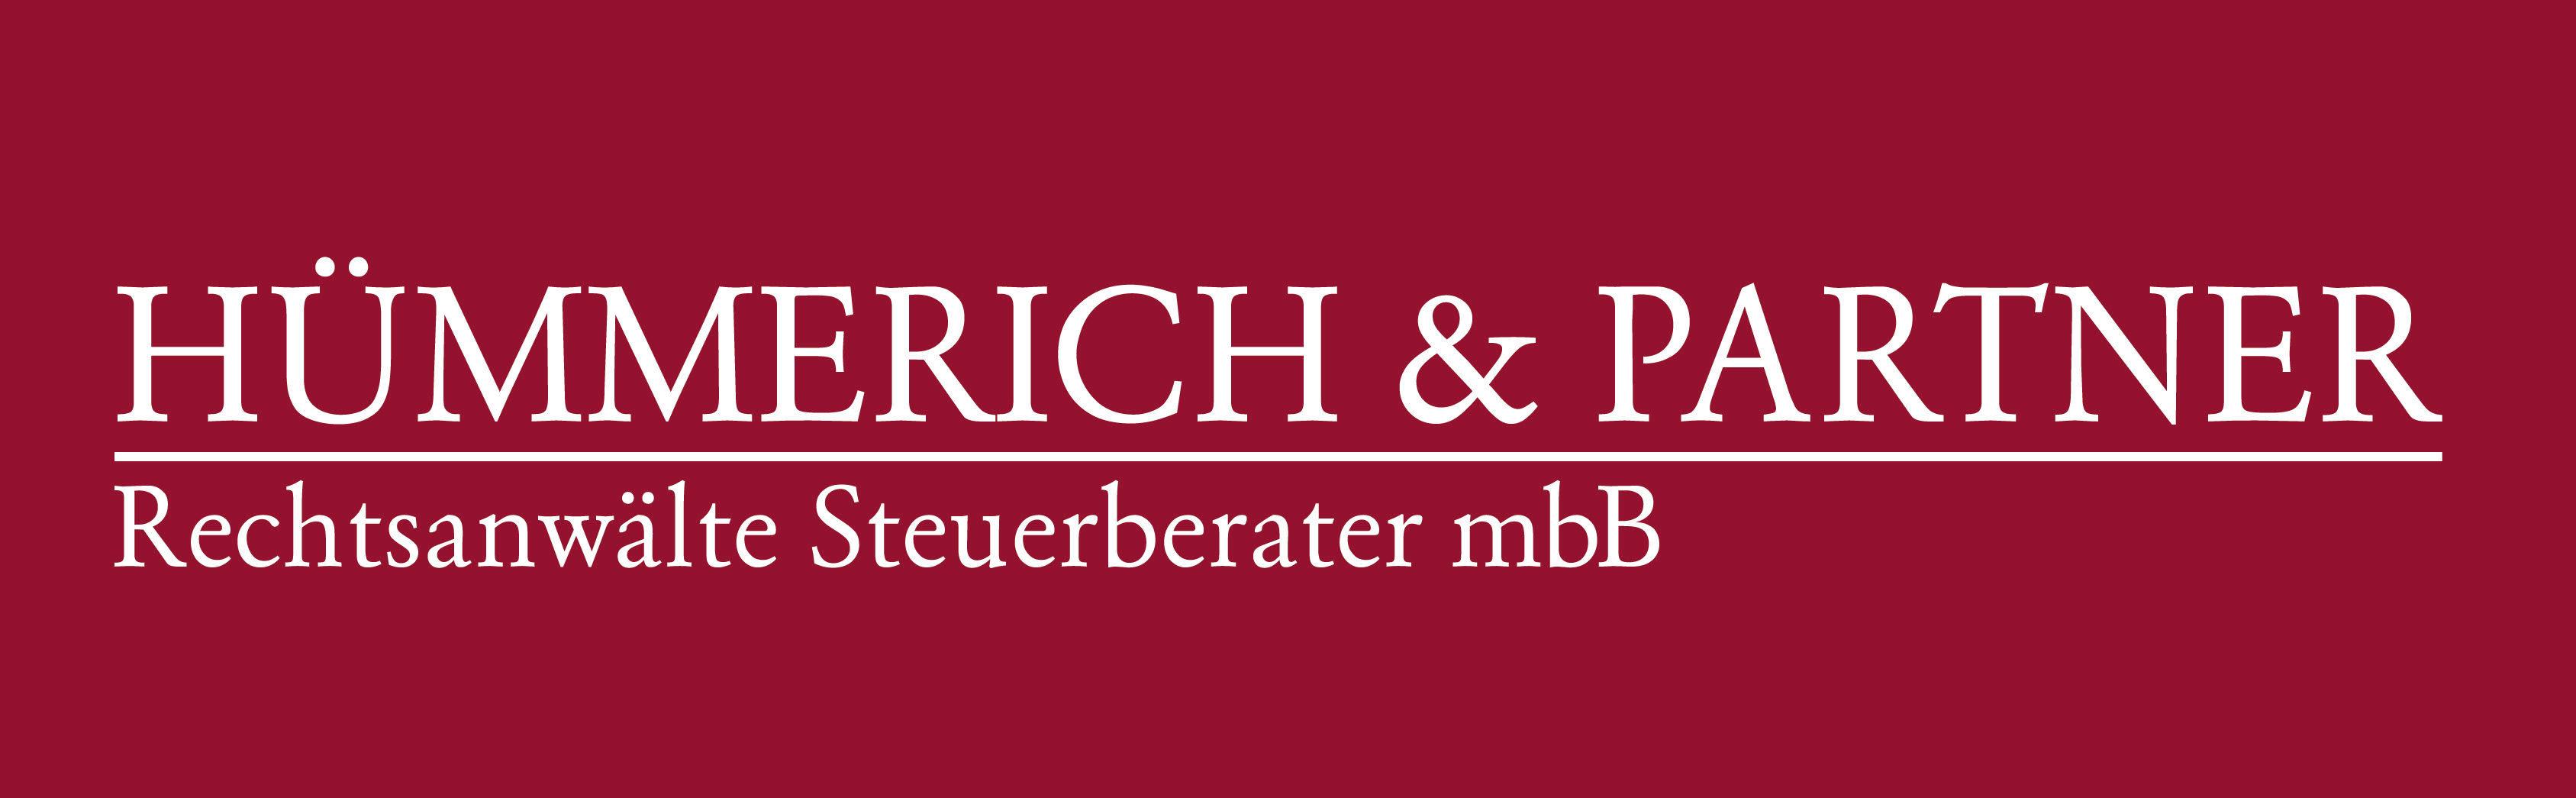 Hümmerich & Partner Rechtsanwälte Steuerberater mbB